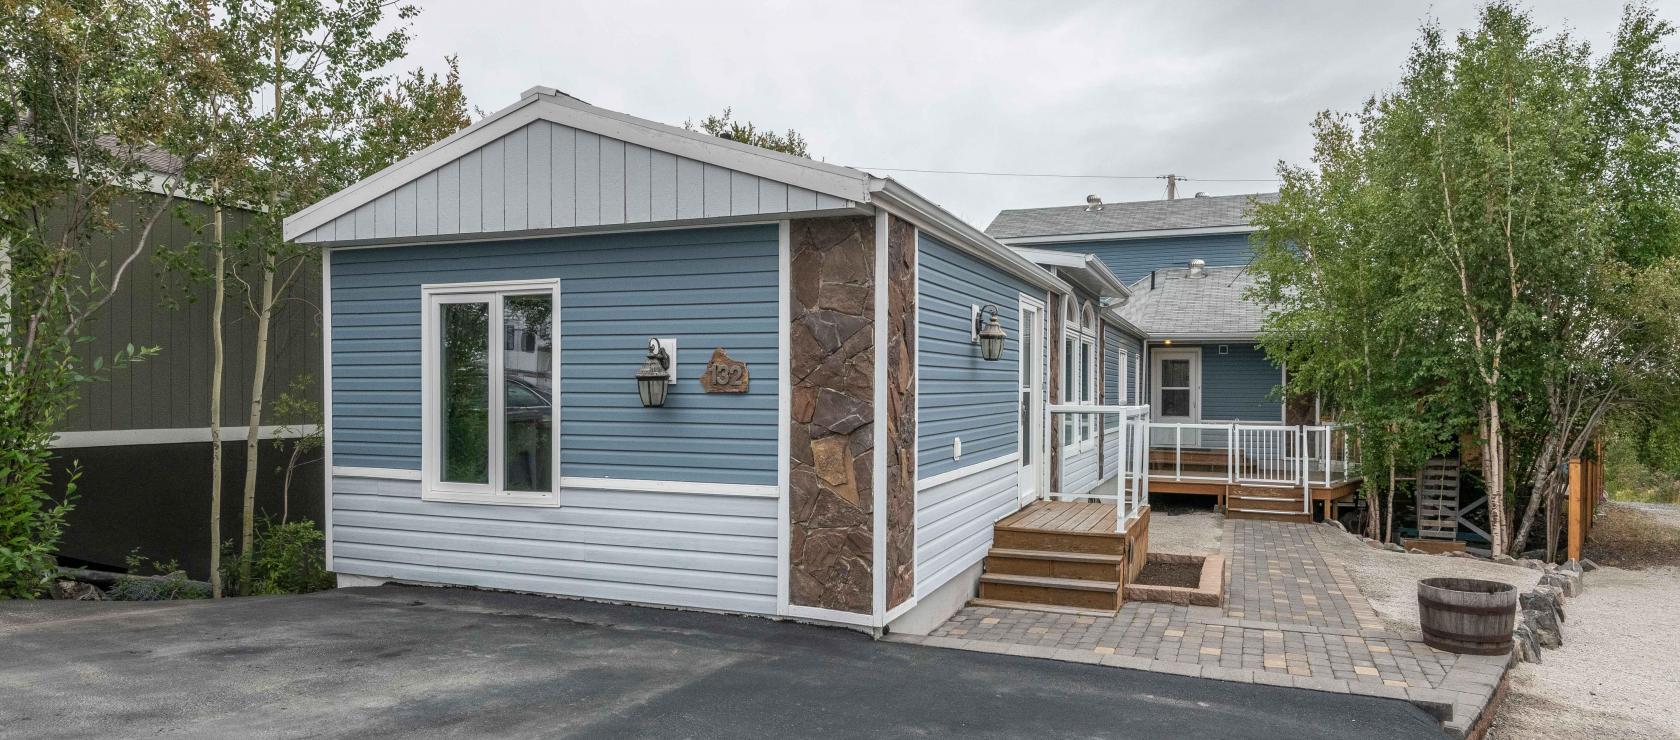 132 Wilkinson Crescent, Range Lake, Yellowknife 2